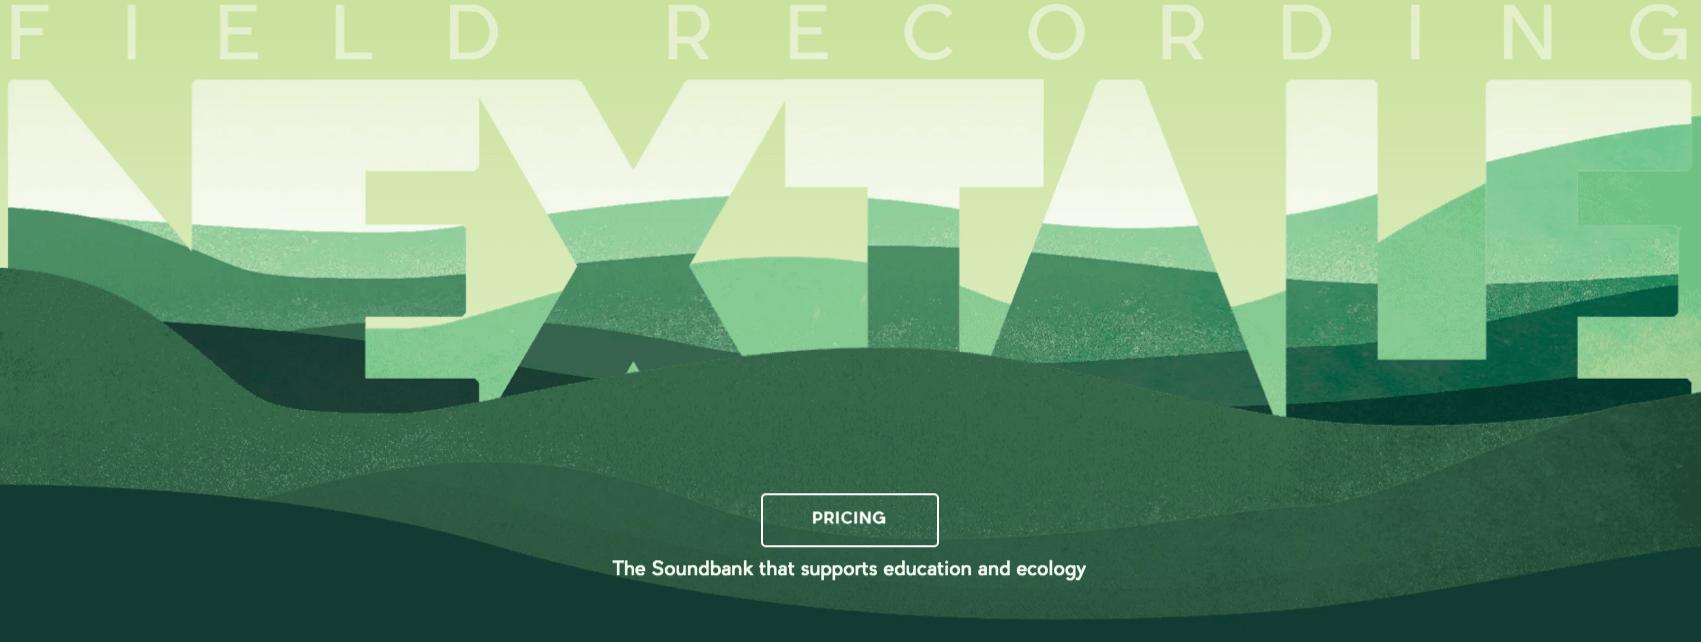 Nextale field recording